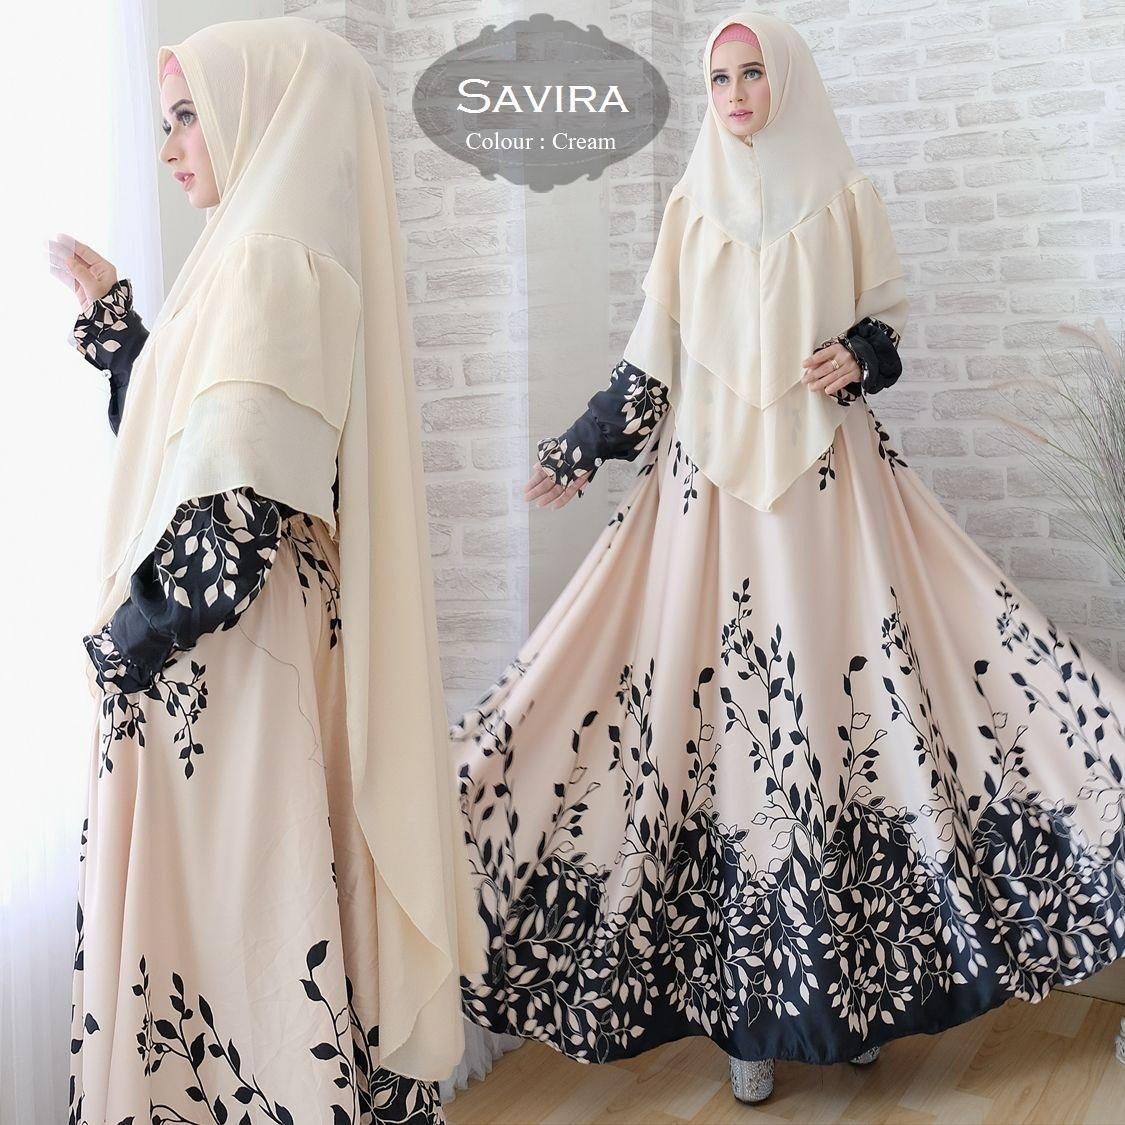 Popuri Fashion Gamis Savira IMPORT Syari Bergo Busui Murah Jumbo Pesta Terbaru Hijab Set Syar I Modern Kekinian Lebaran Mewah Muslim Maxi Dress Wanita Arab Muslimah Kondangan Setelan Kombinasi Elegan Moderen Stelan Elegant Kaftan Abaya Jumsuit Jamsuit XL